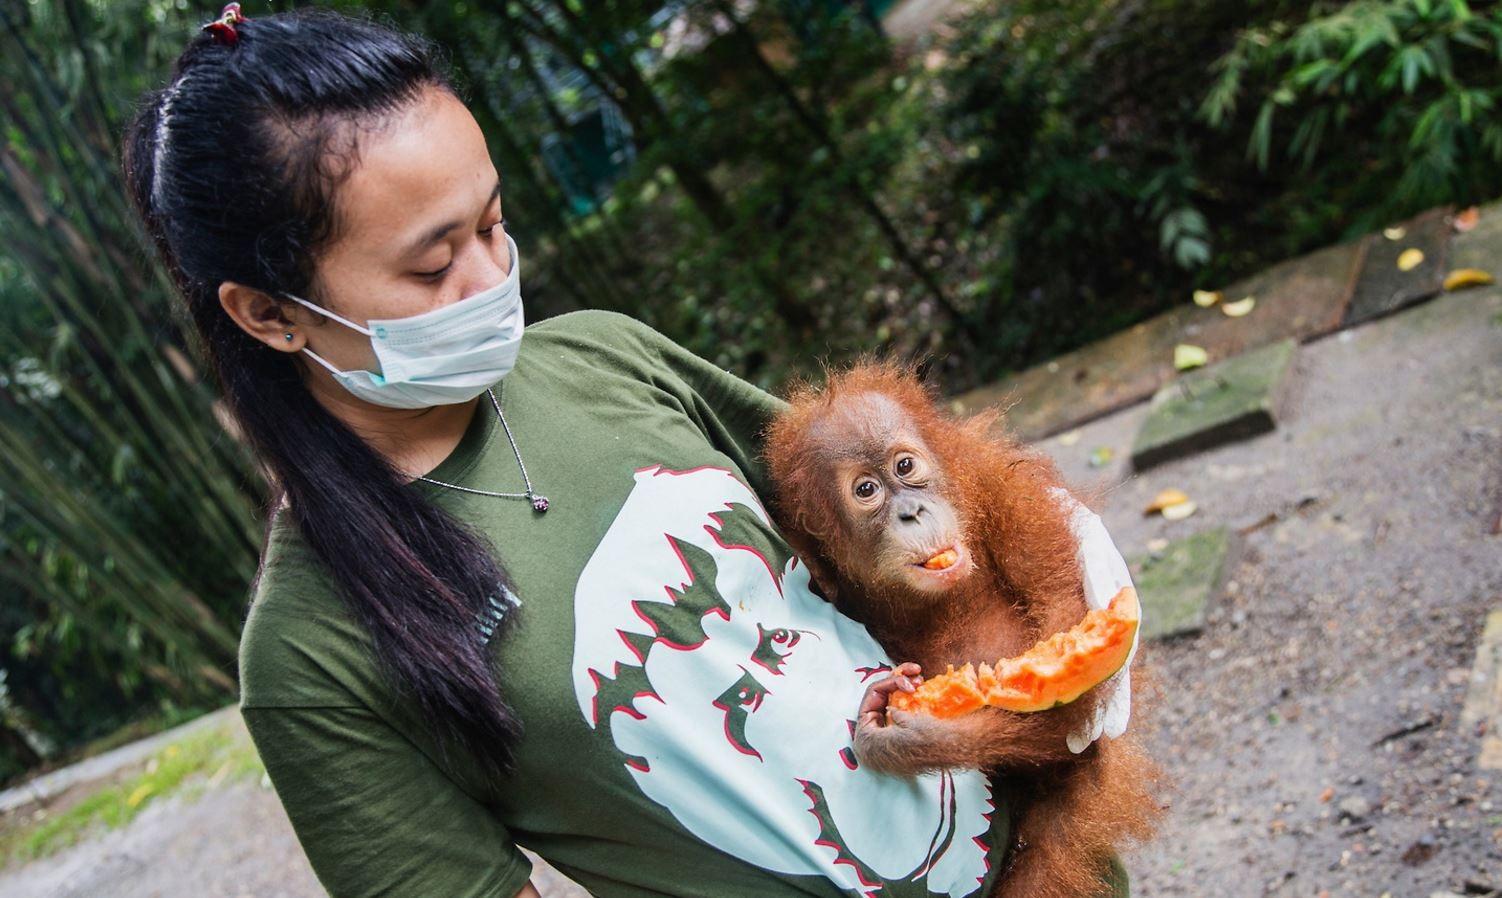 Image: Orphanage helper with baby orangutan eat a papaya